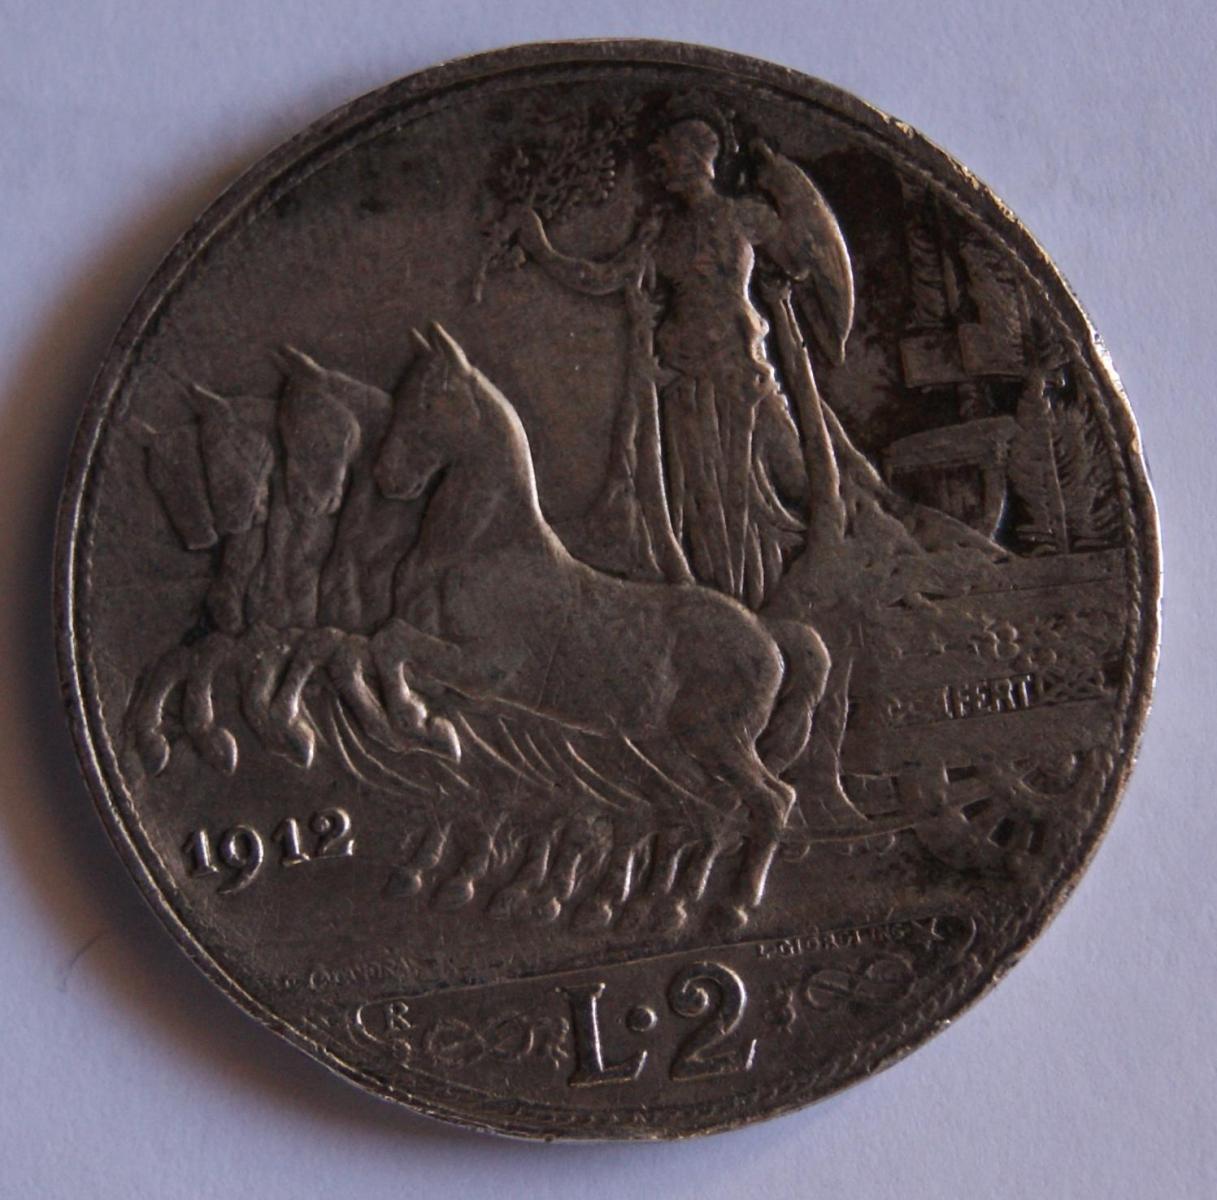 2 lire 1912 A.jpg